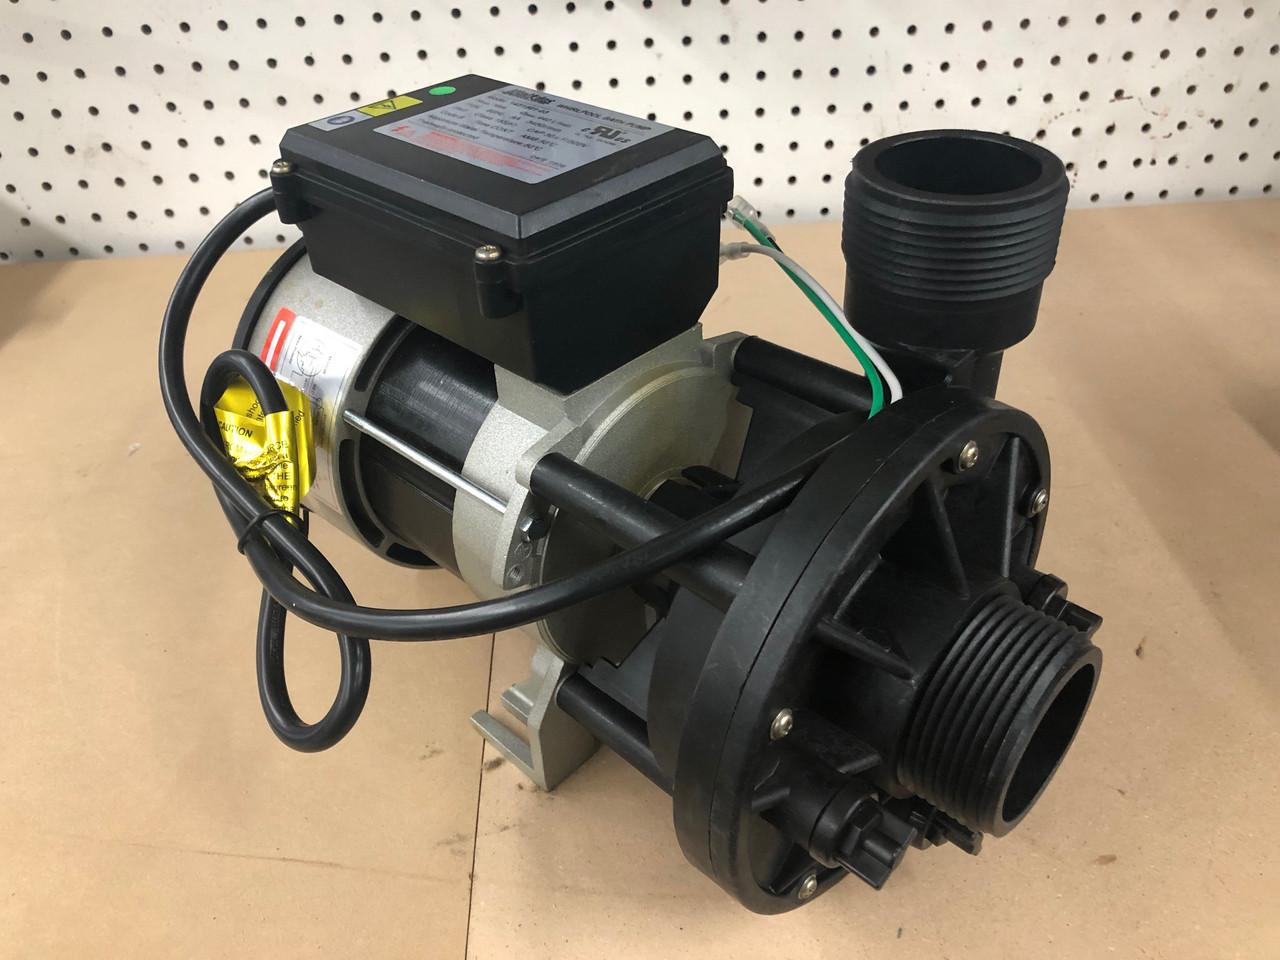 freeflow spas pump 1 5 hp 1spd 115v 60hz part 303001 77406 spa parts depot [ 1280 x 960 Pixel ]